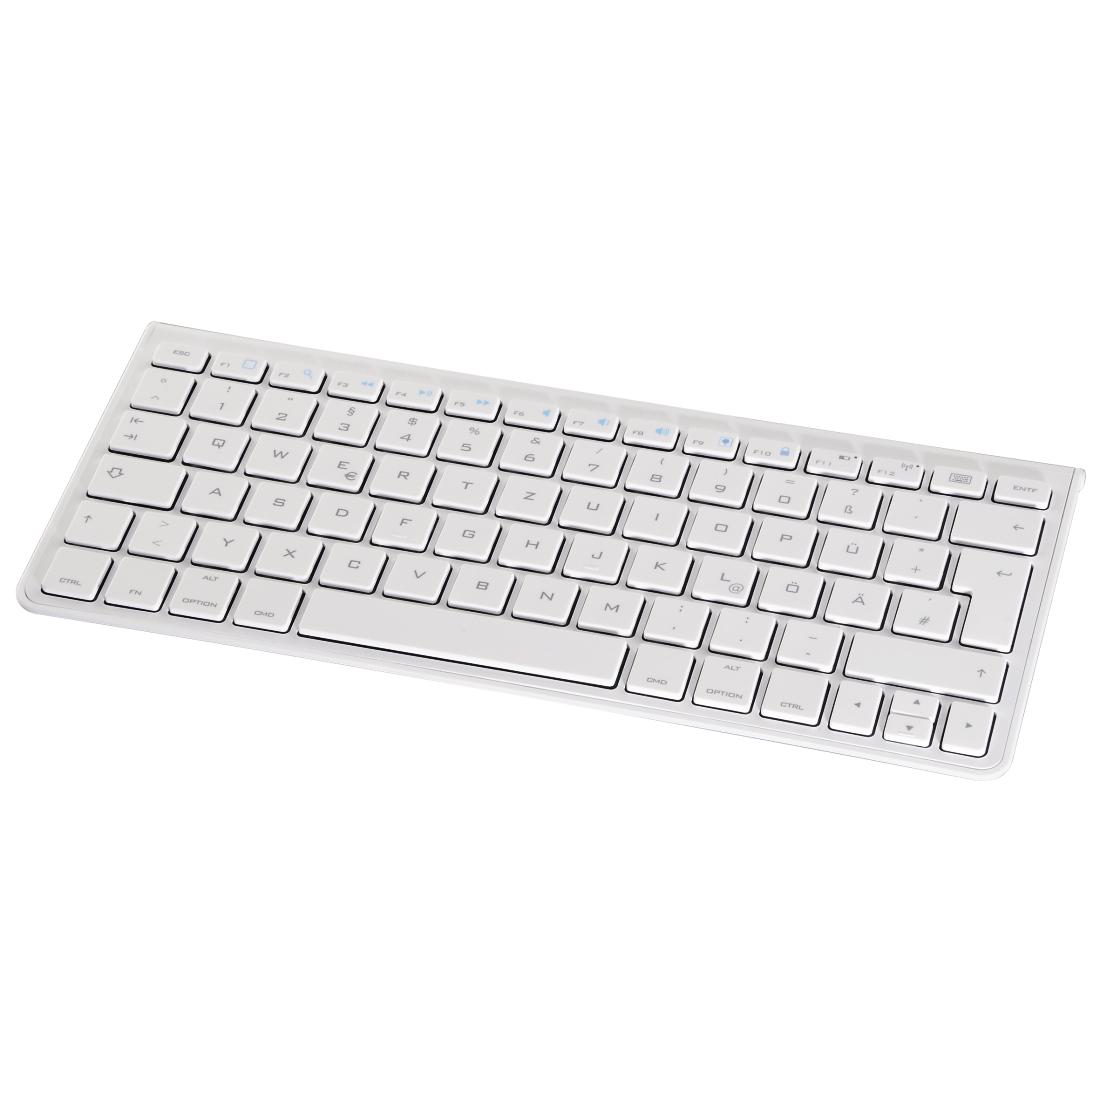 Driver for HAMA Bluetooth Virtual Keyboard